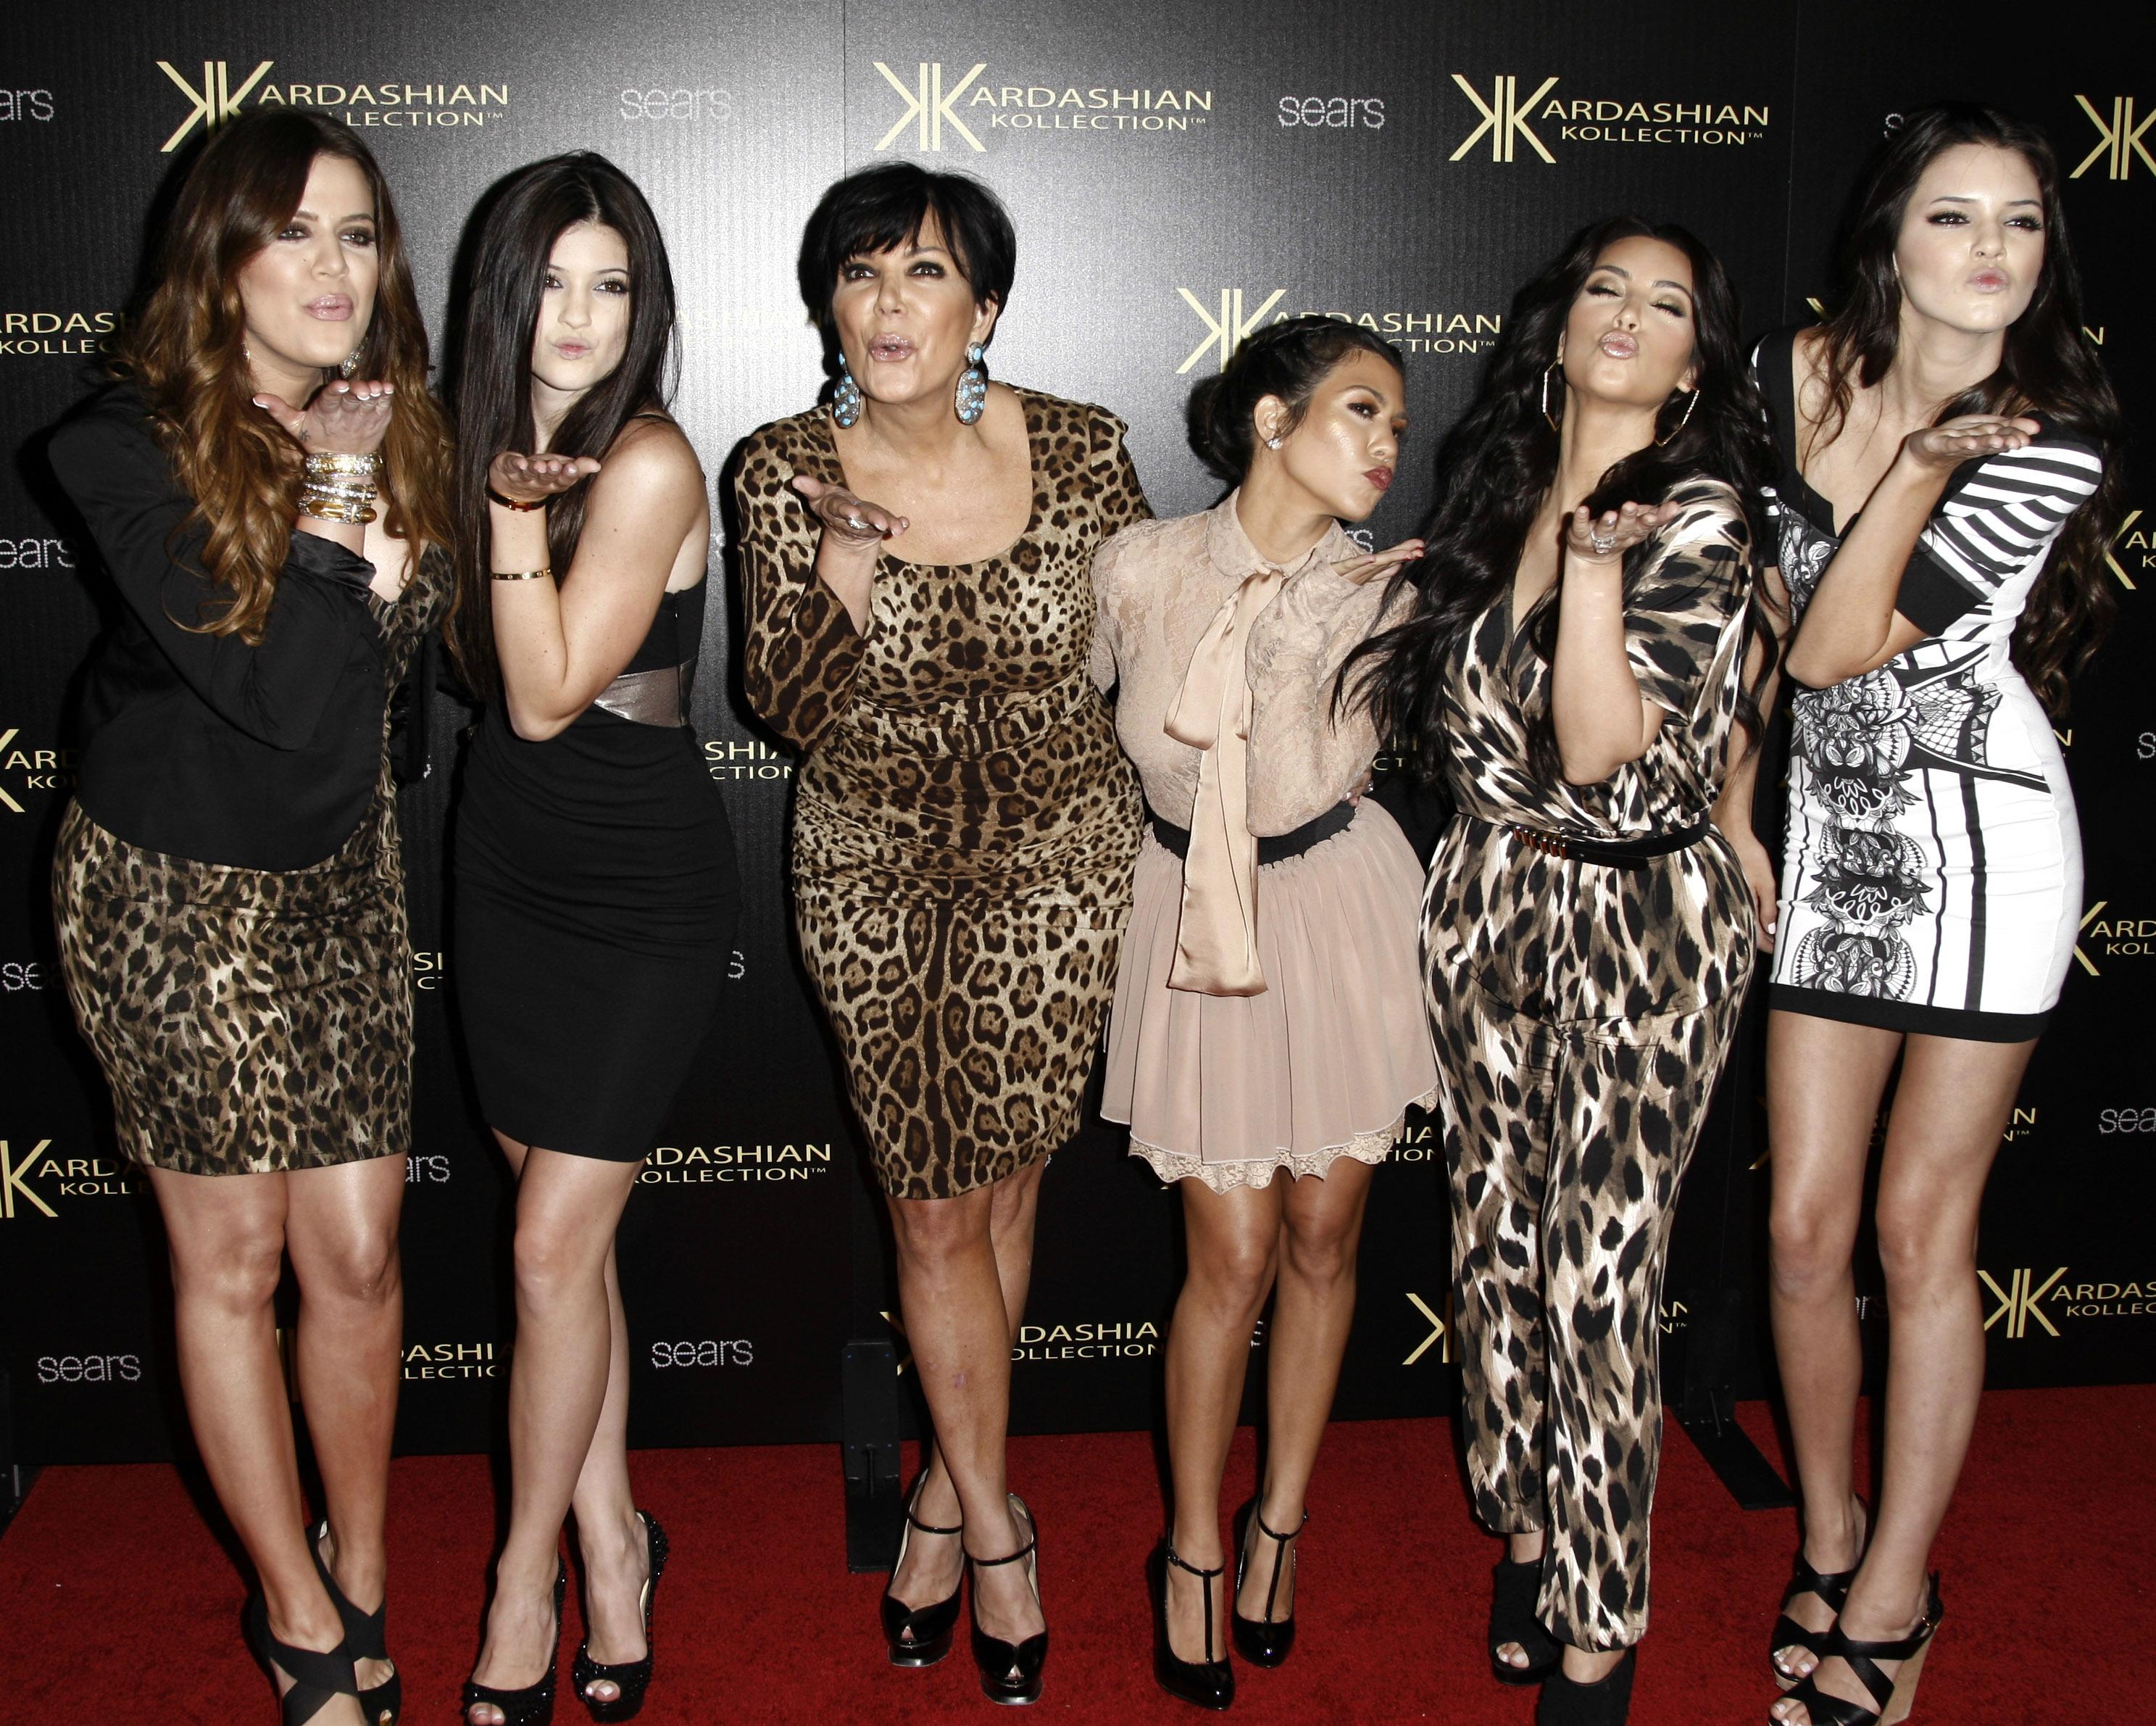 khloe kardashian kylie jenner kris jenner kourtney kardashian kim kardasian kendall jenner